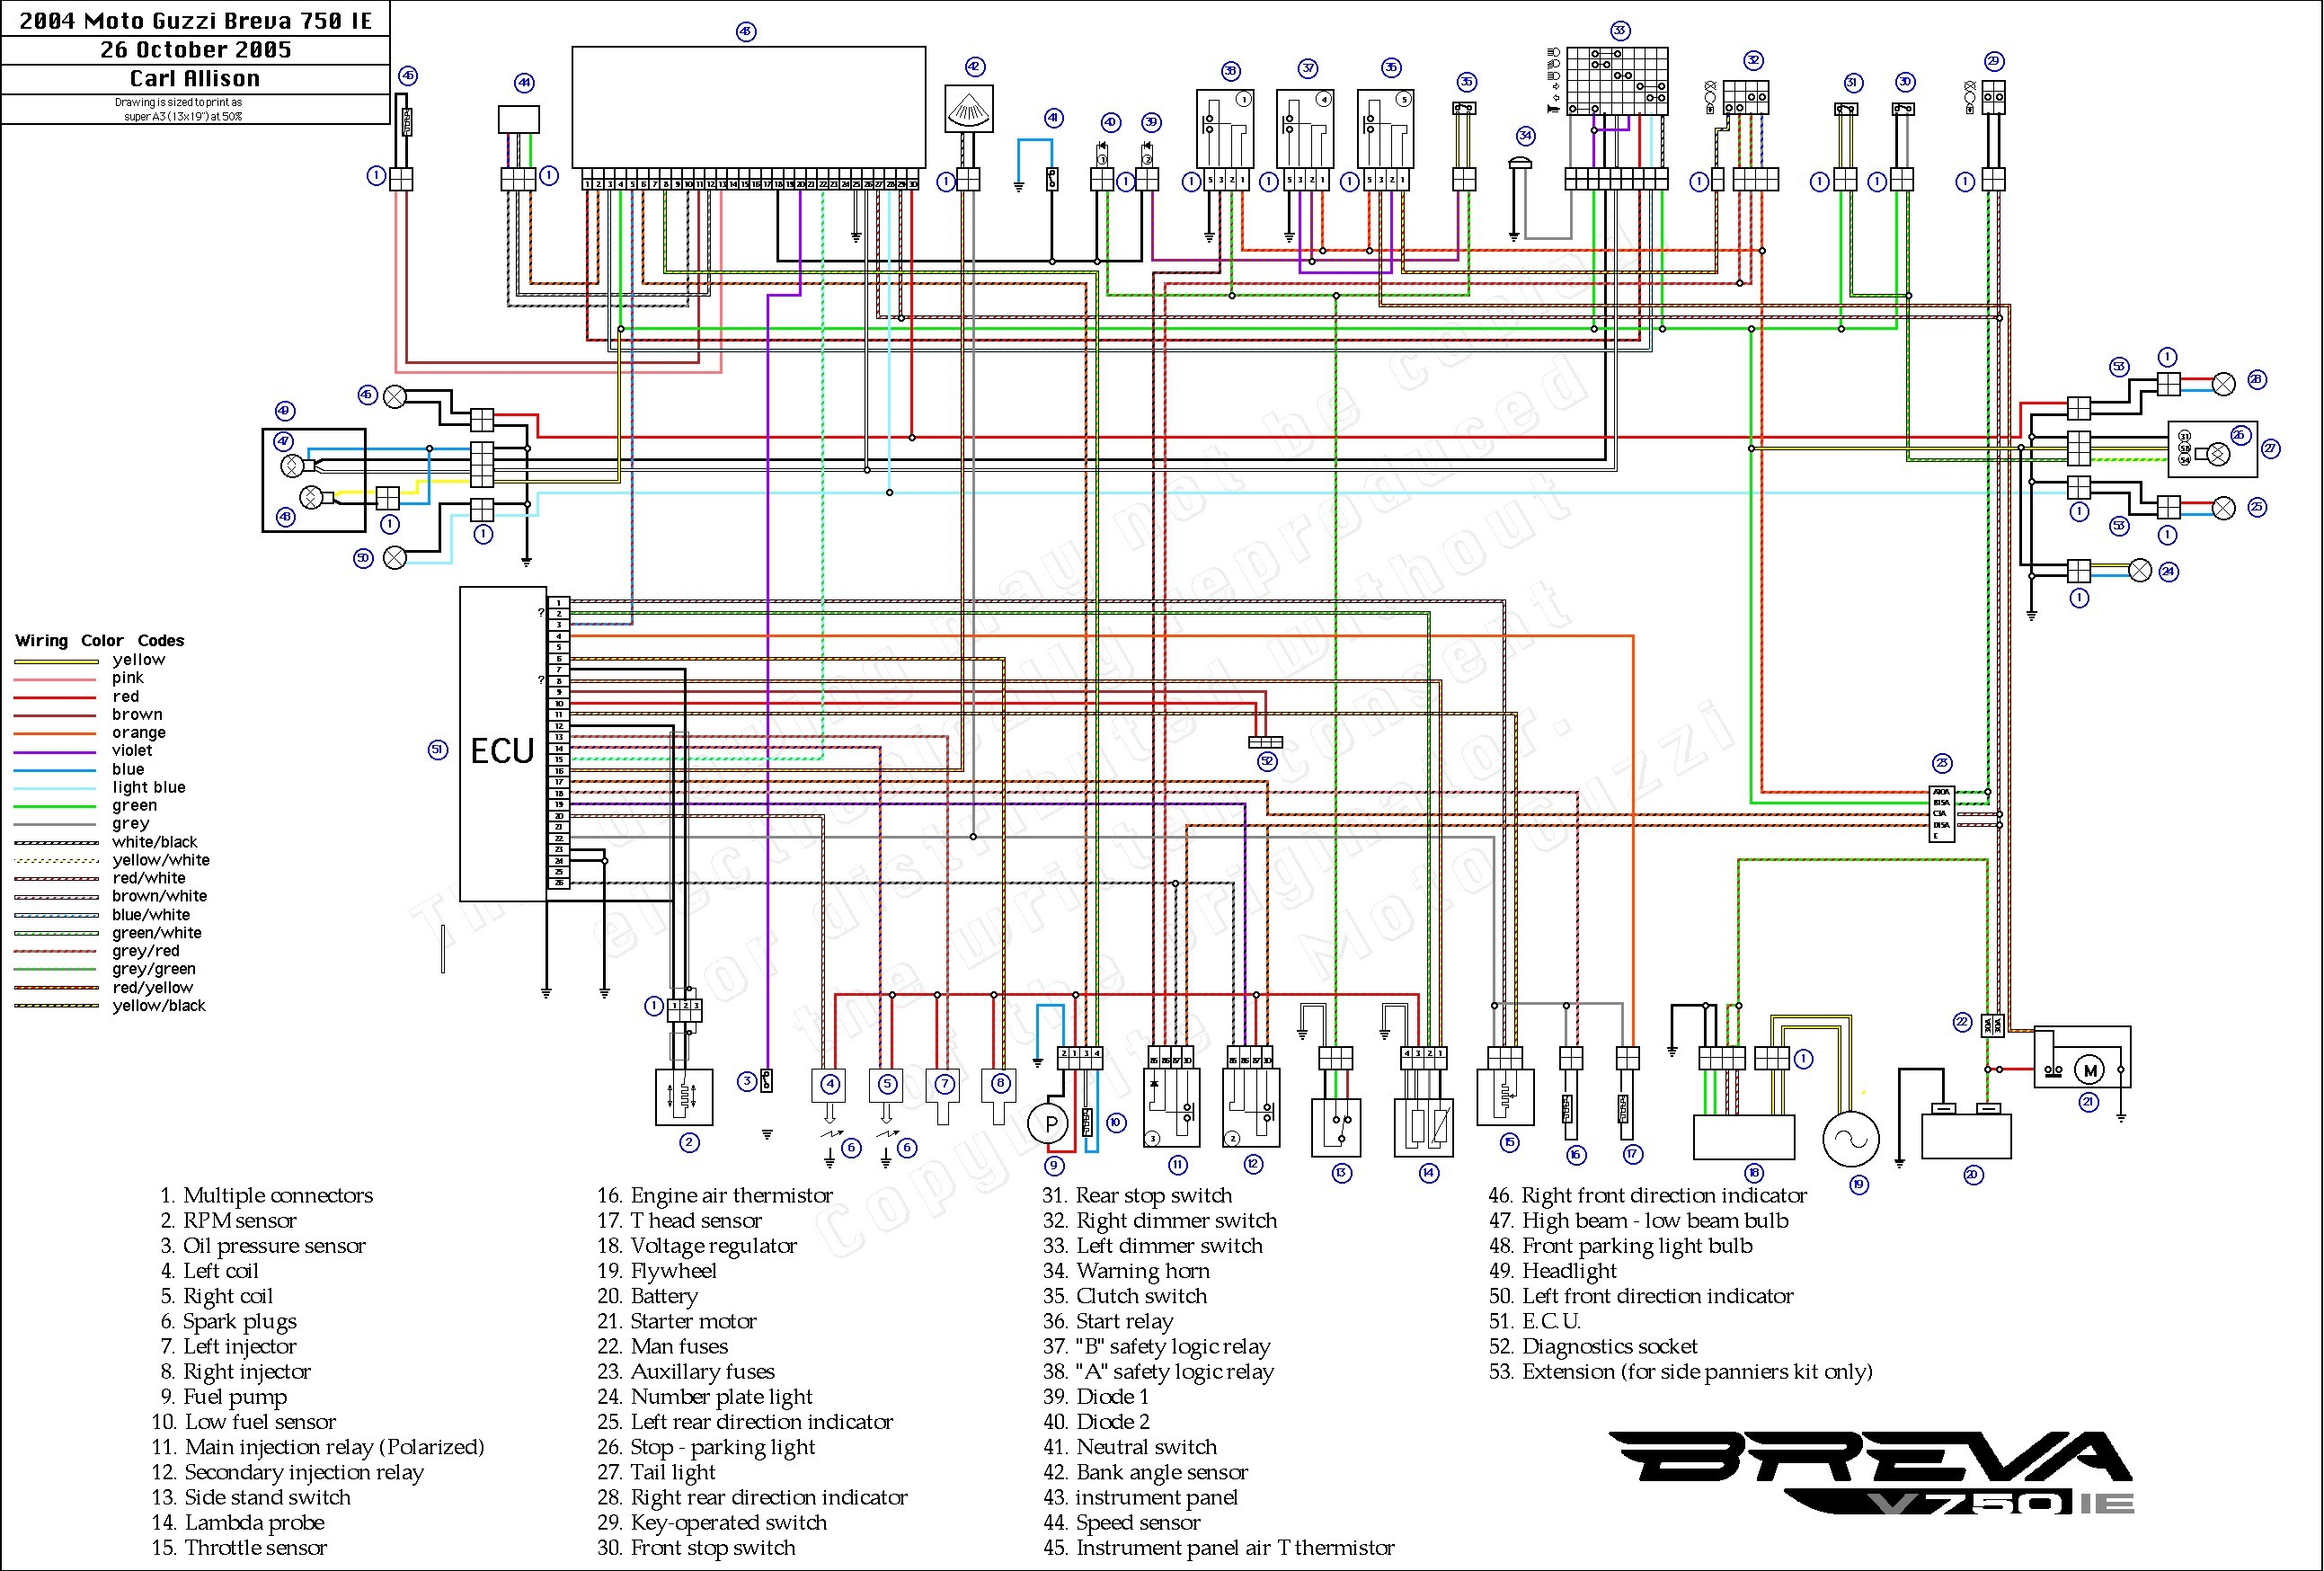 Dodge Ram 1500 Engine Diagram 2004 Dodge Ram Wiring Diagram Copy Wiring Diagram Dodge Ram 1500 Of Dodge Ram 1500 Engine Diagram